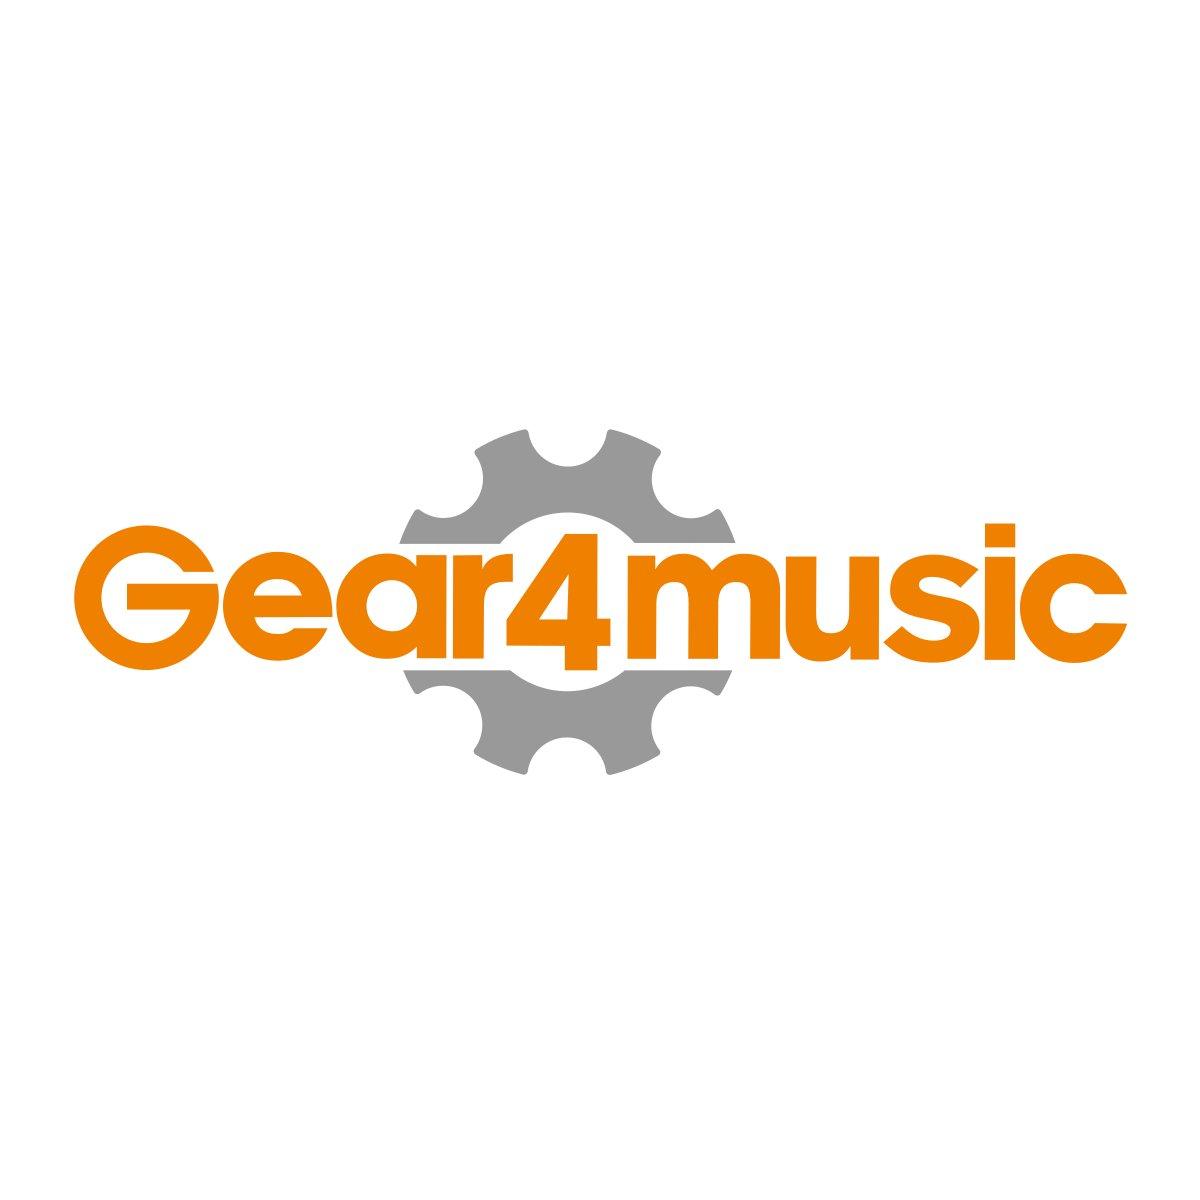 Image of 4U 19 inch Rack Bag by Gear4music